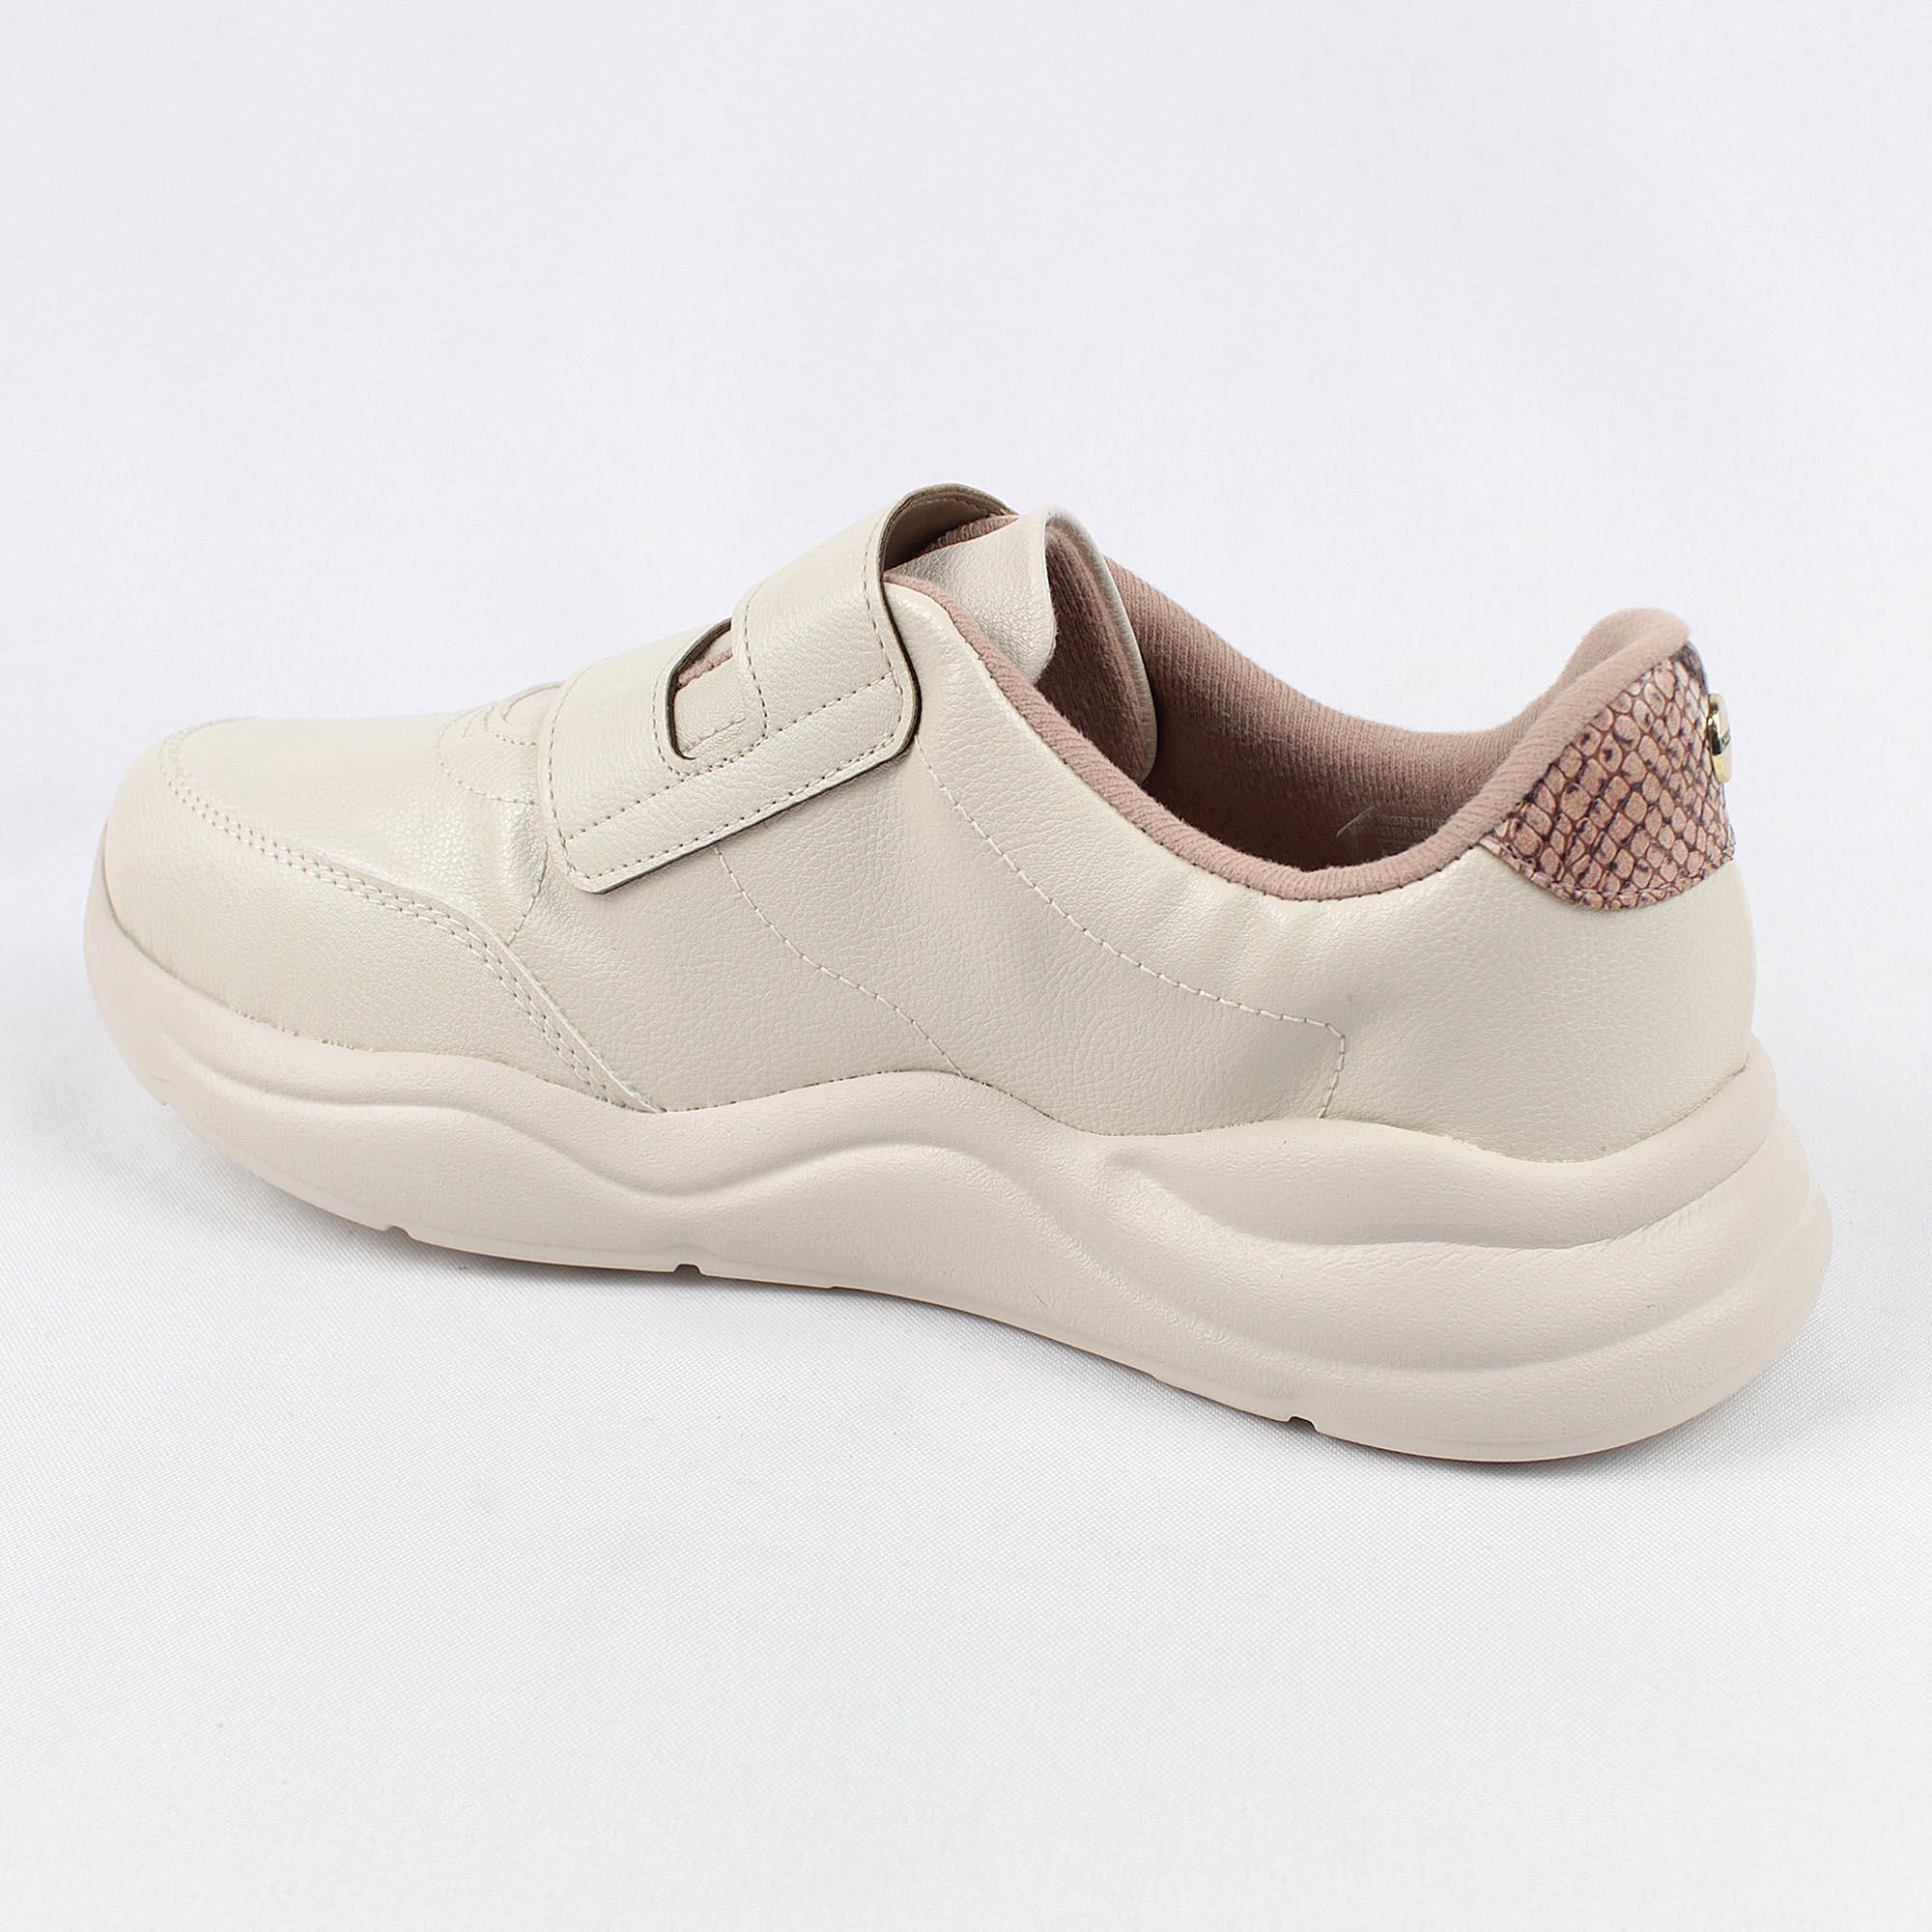 Tênis Feminino Modare Confort 7362.102